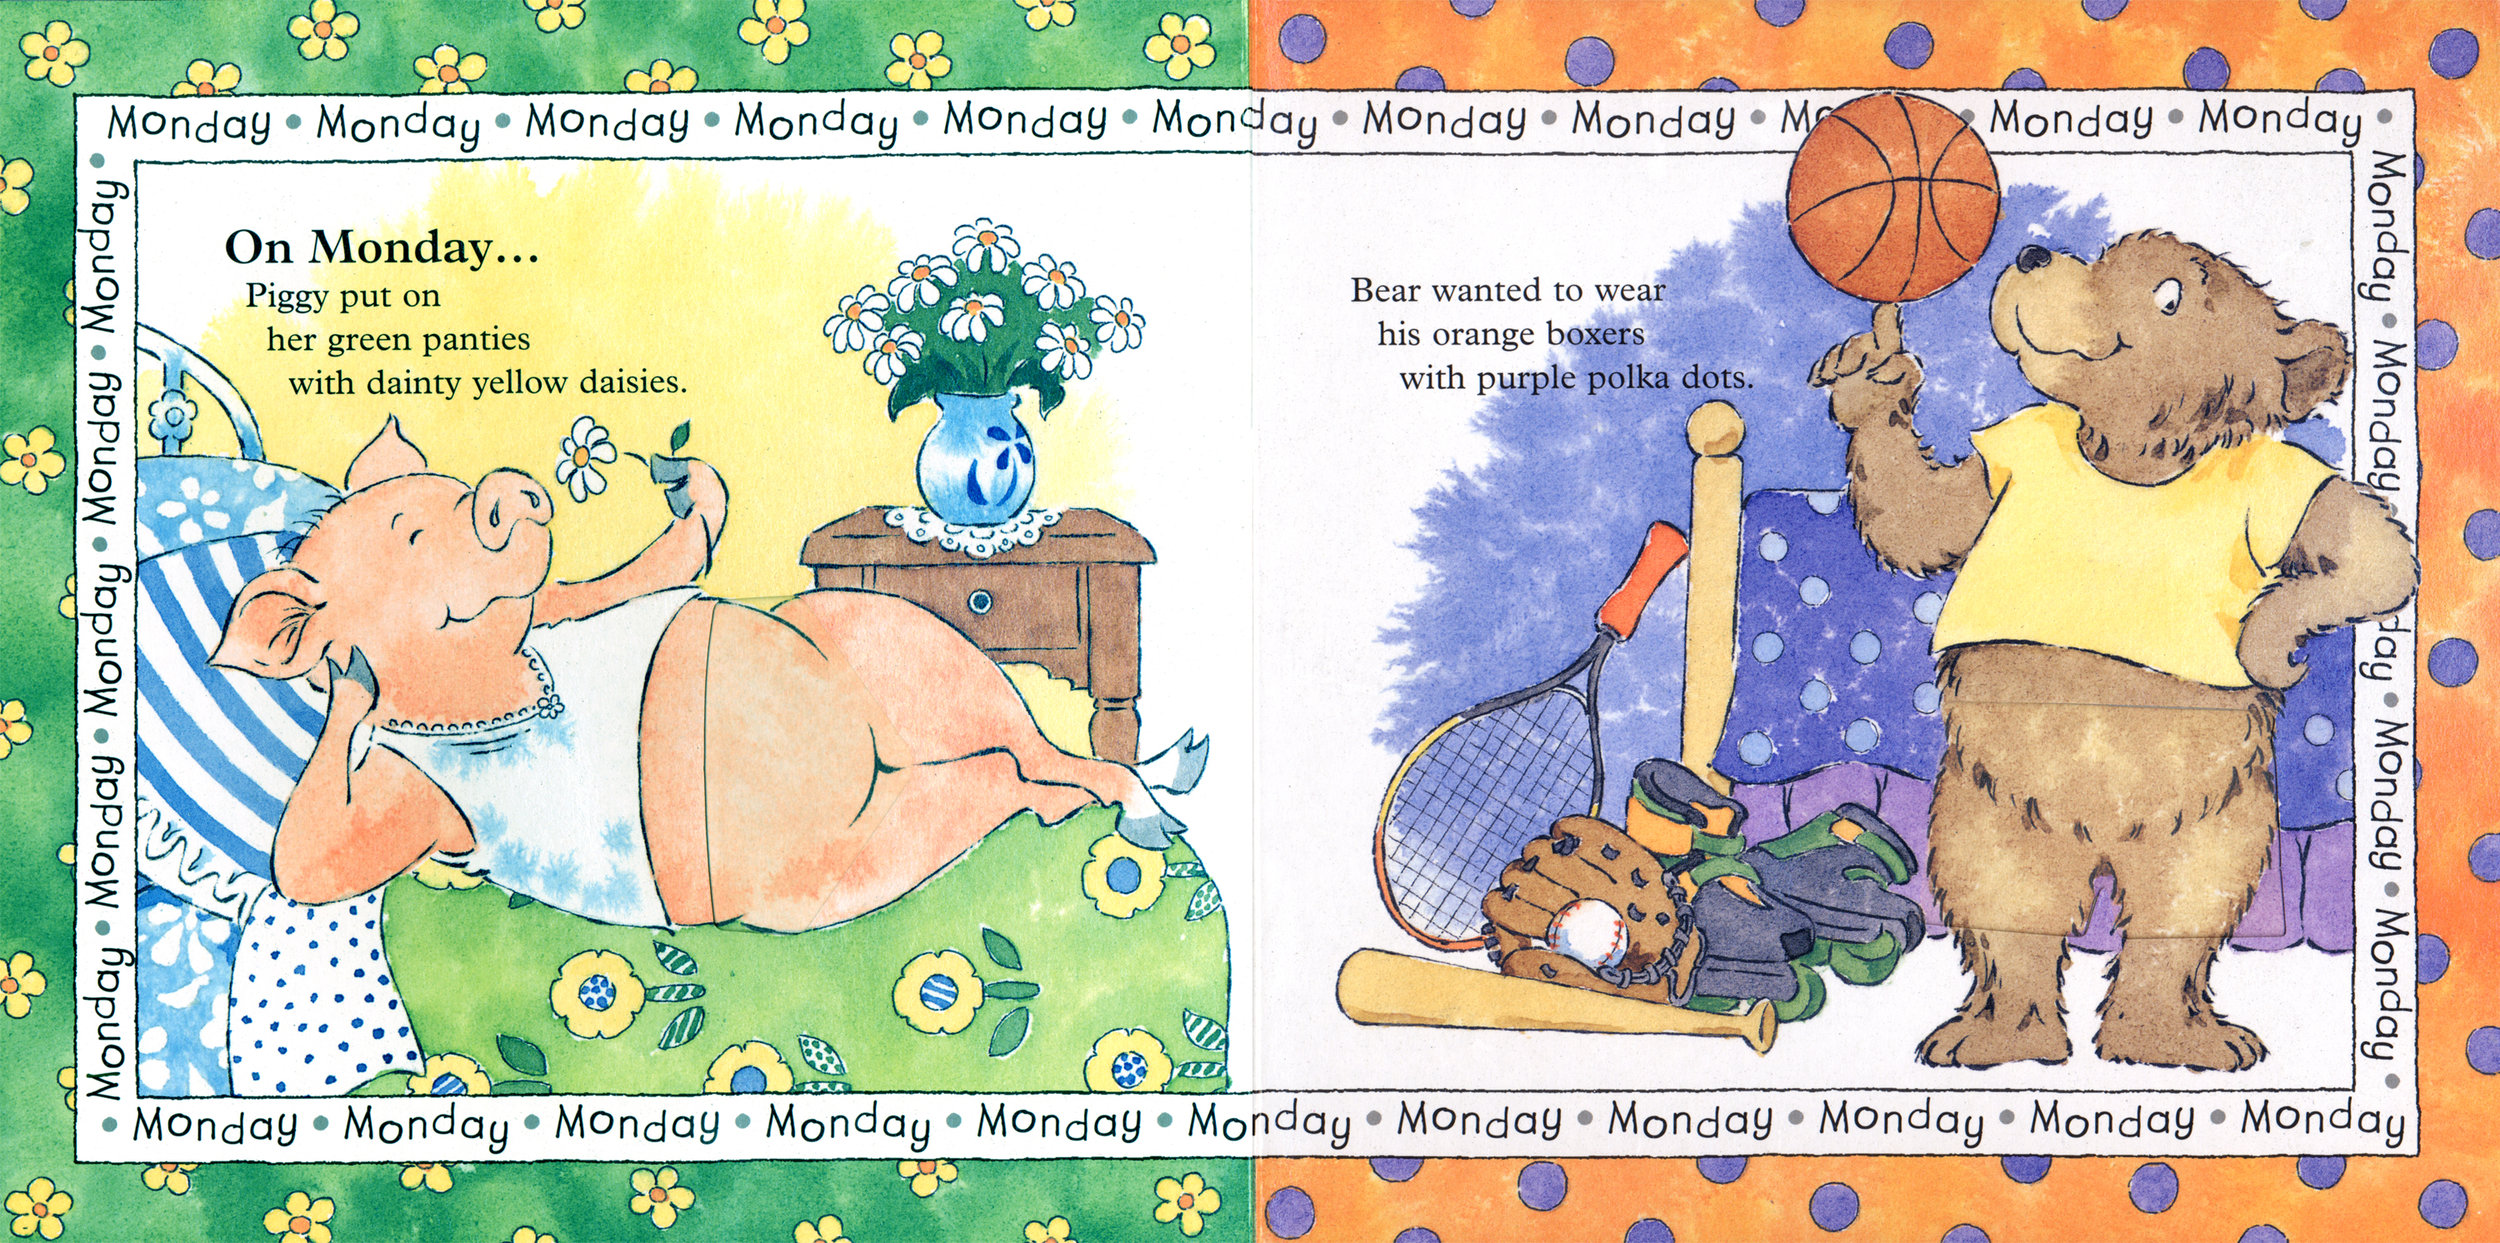 MondayPiggy&Bear.jpg